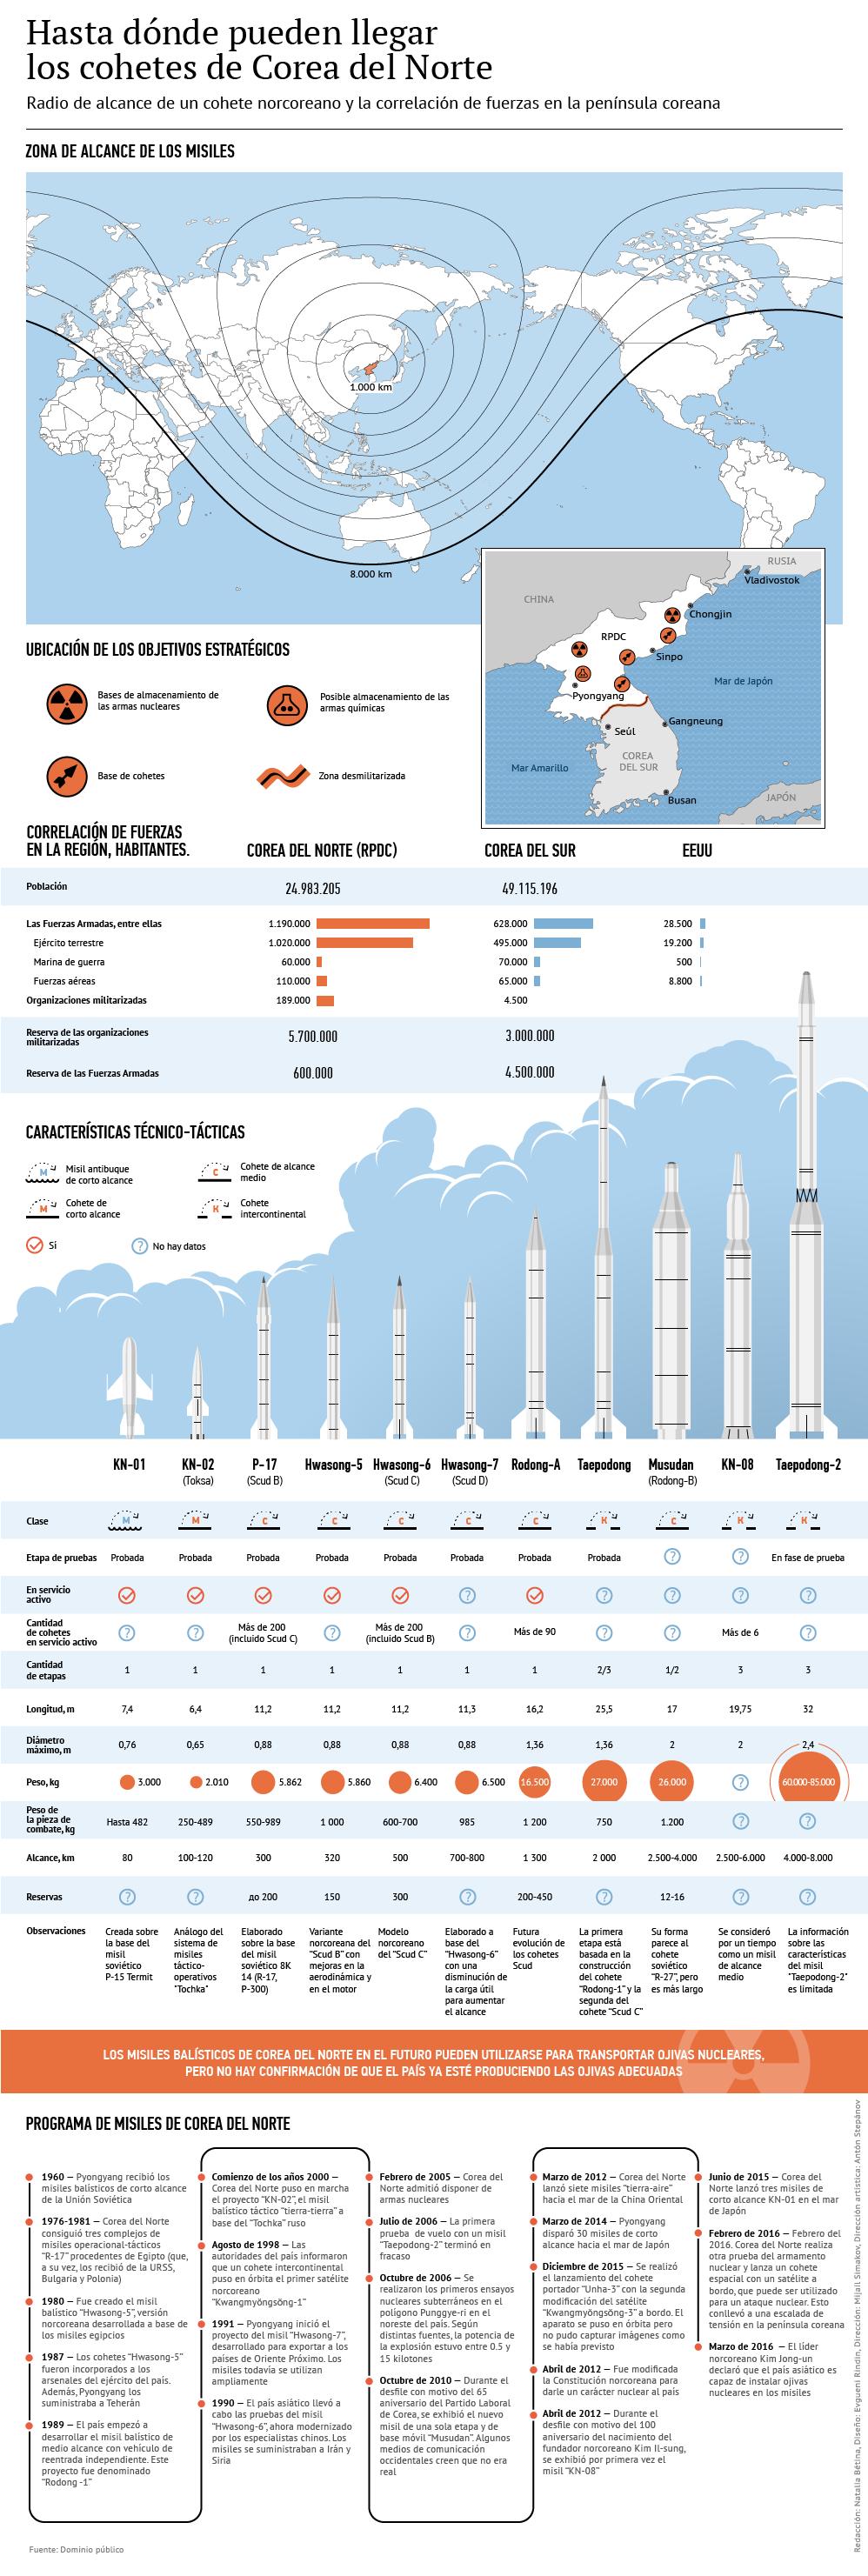 Cohetes norcoreanos - Sputnik Mundo